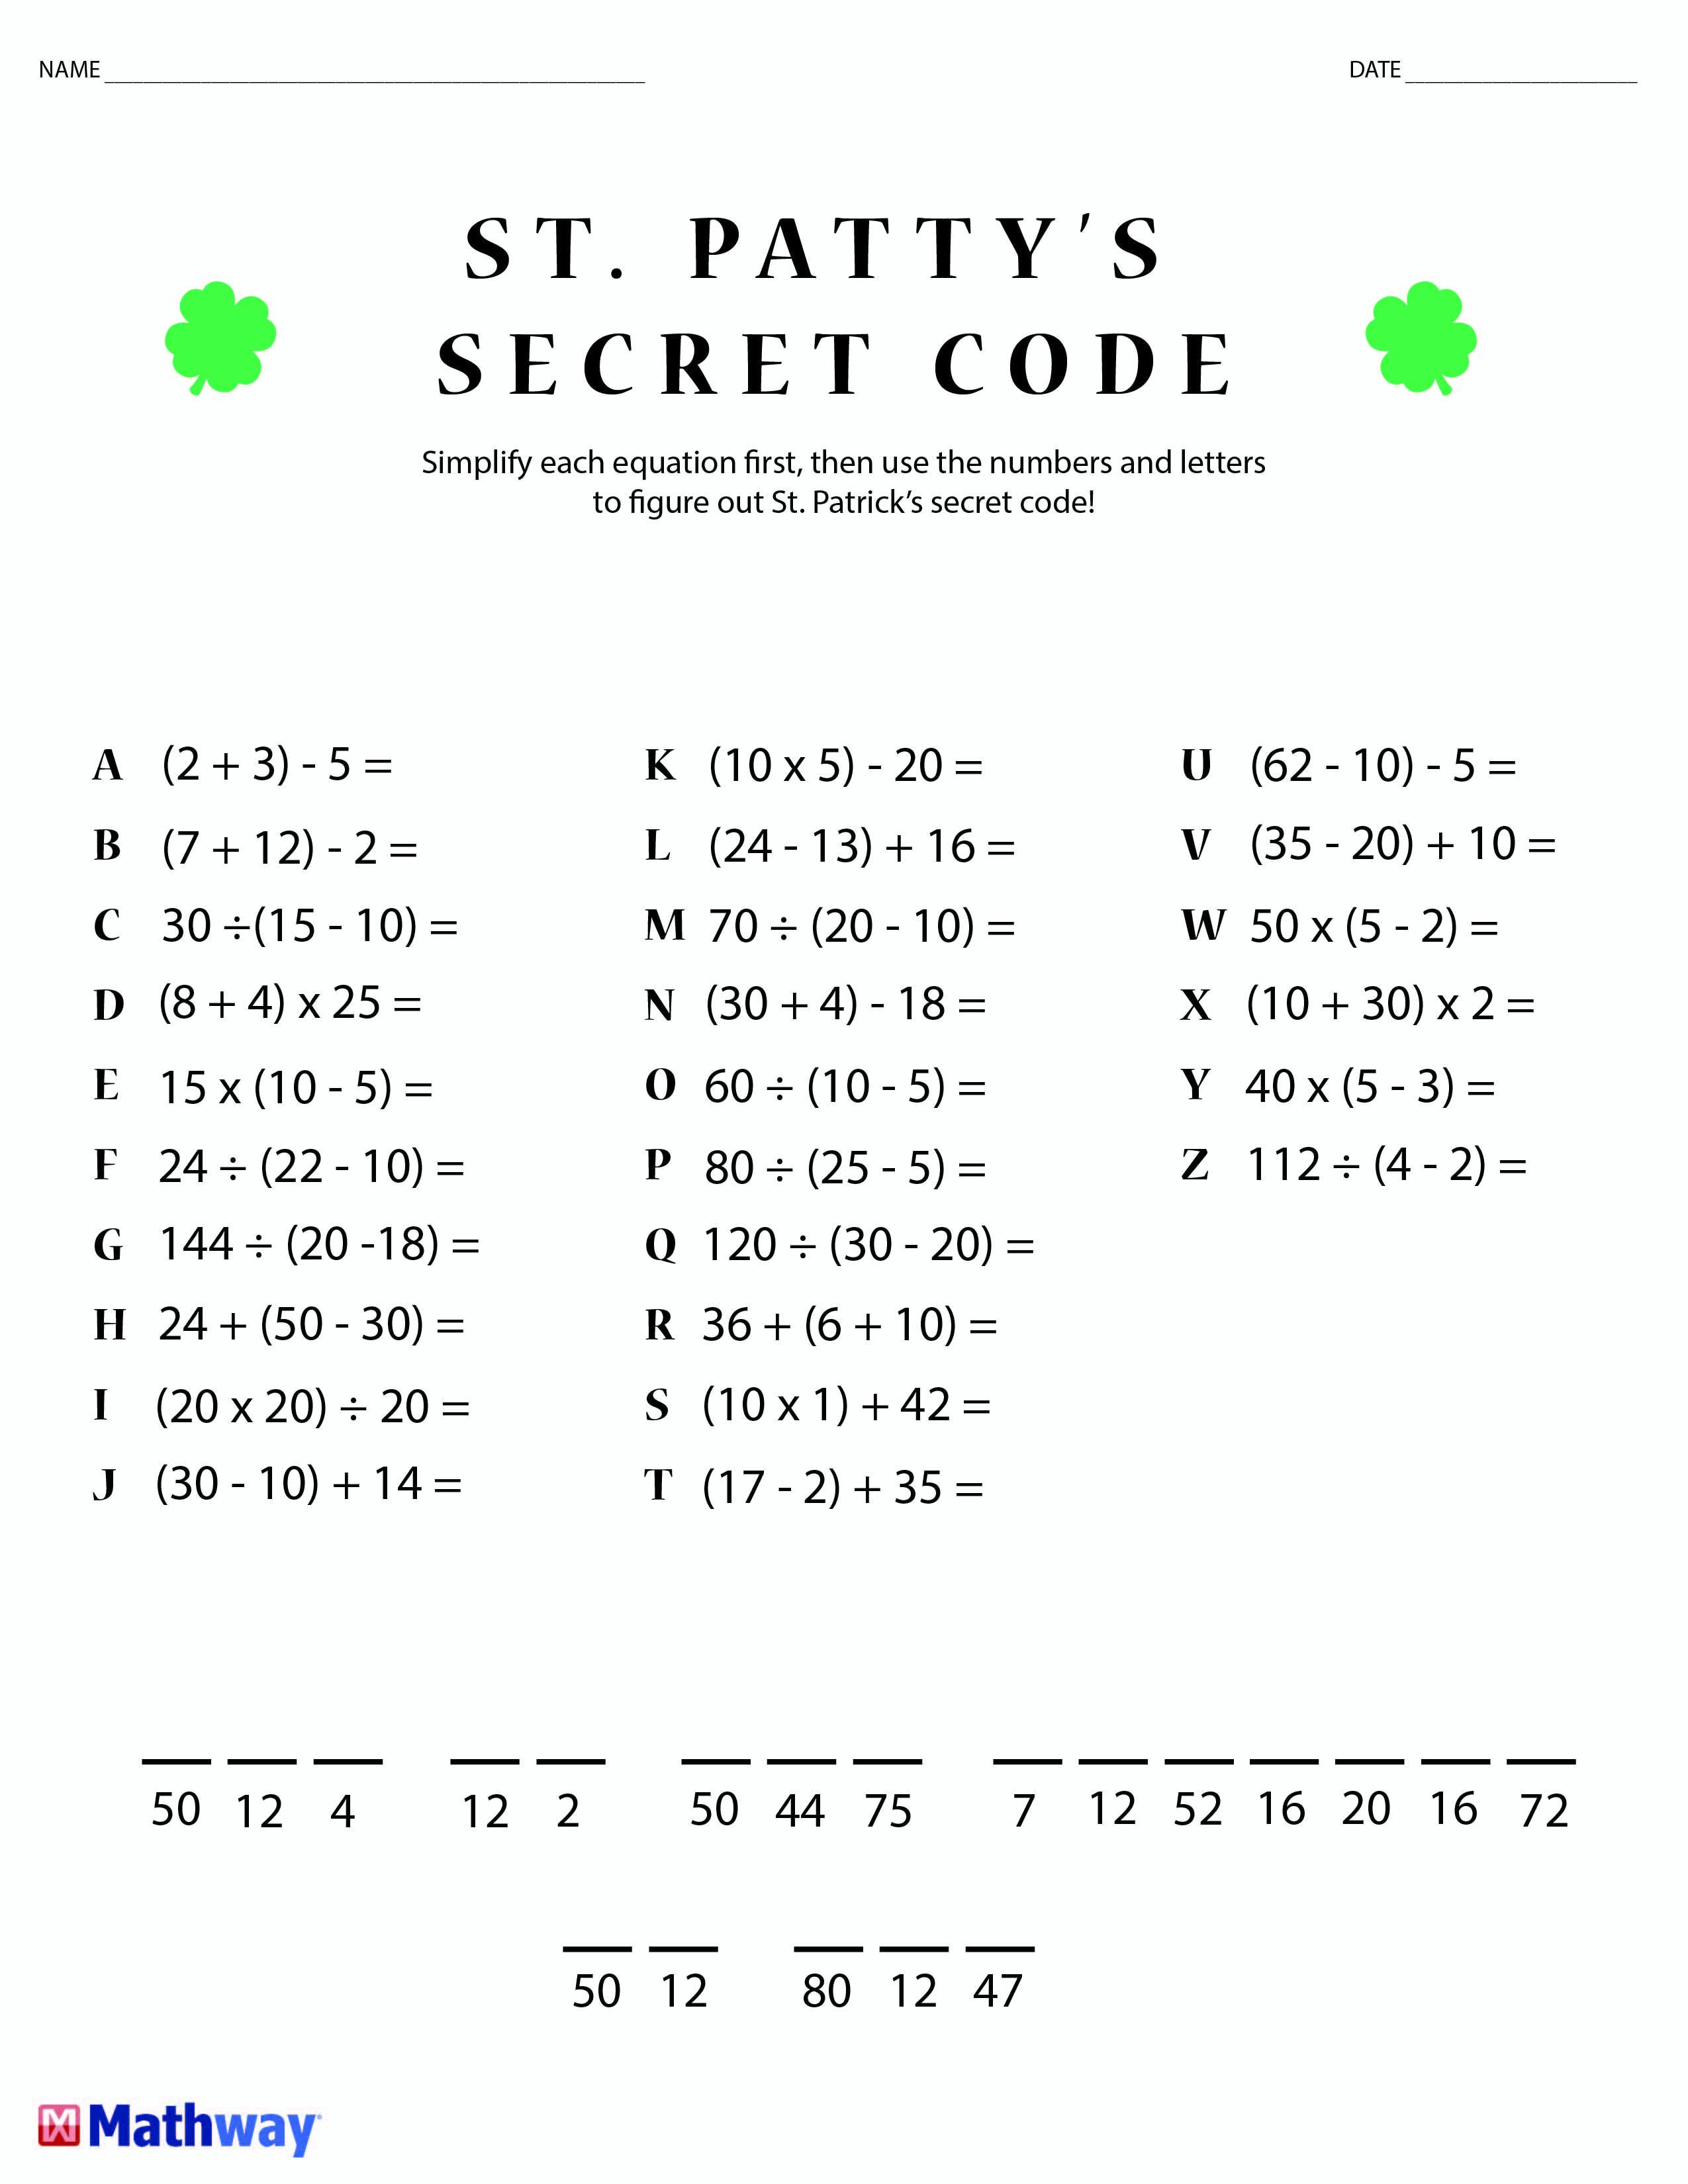 St. Patty's Day Crack The Secret Code Worksheet! Print This One Out   Printable Secret Code Worksheets